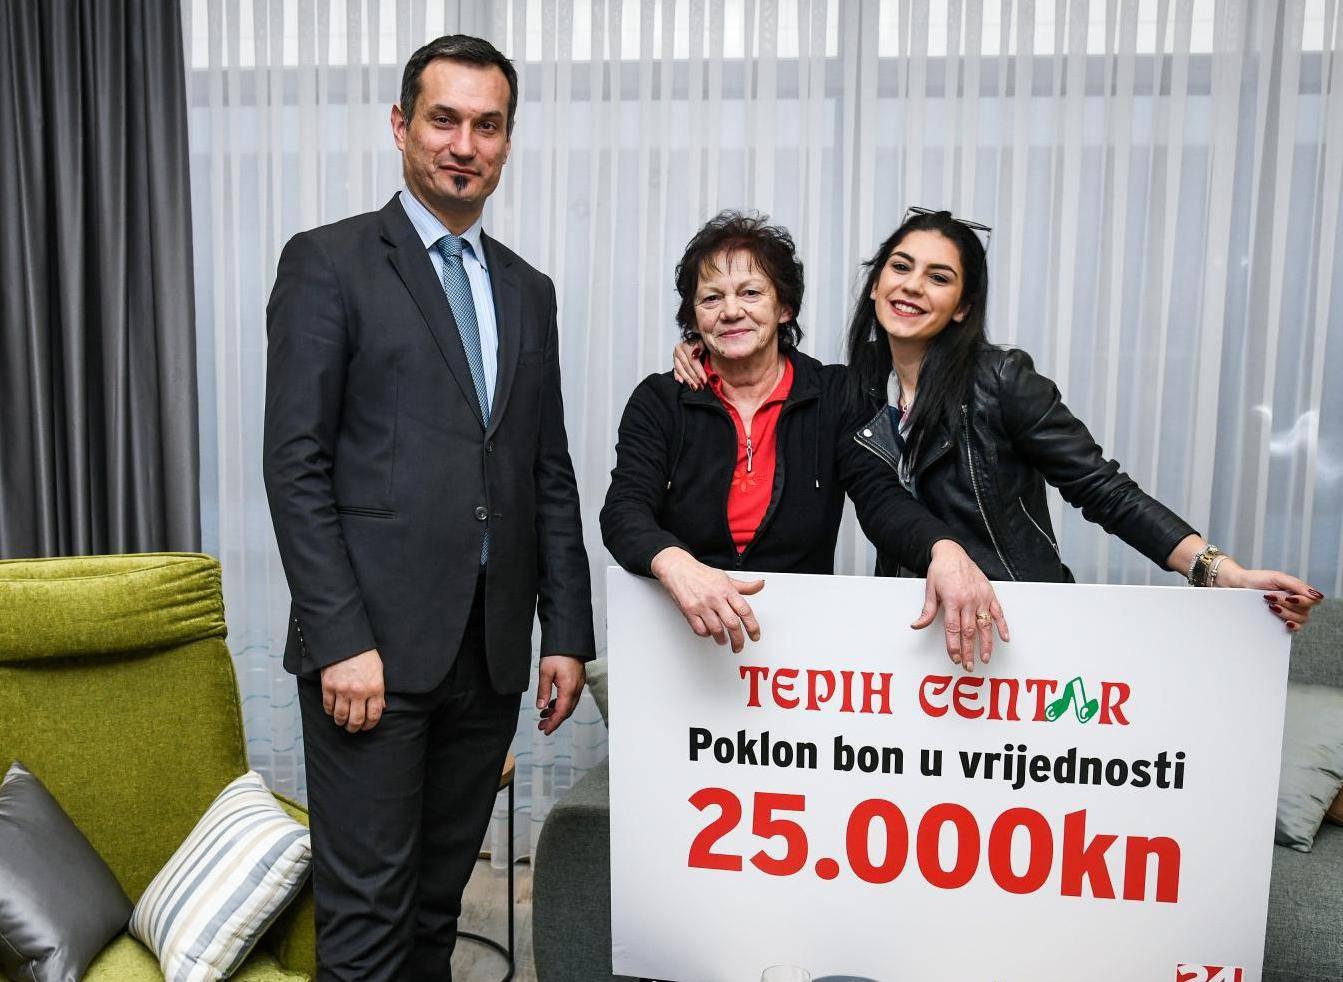 Nada osvojila 25.000 kuna: Uz Tepih centar ću si urediti kuću